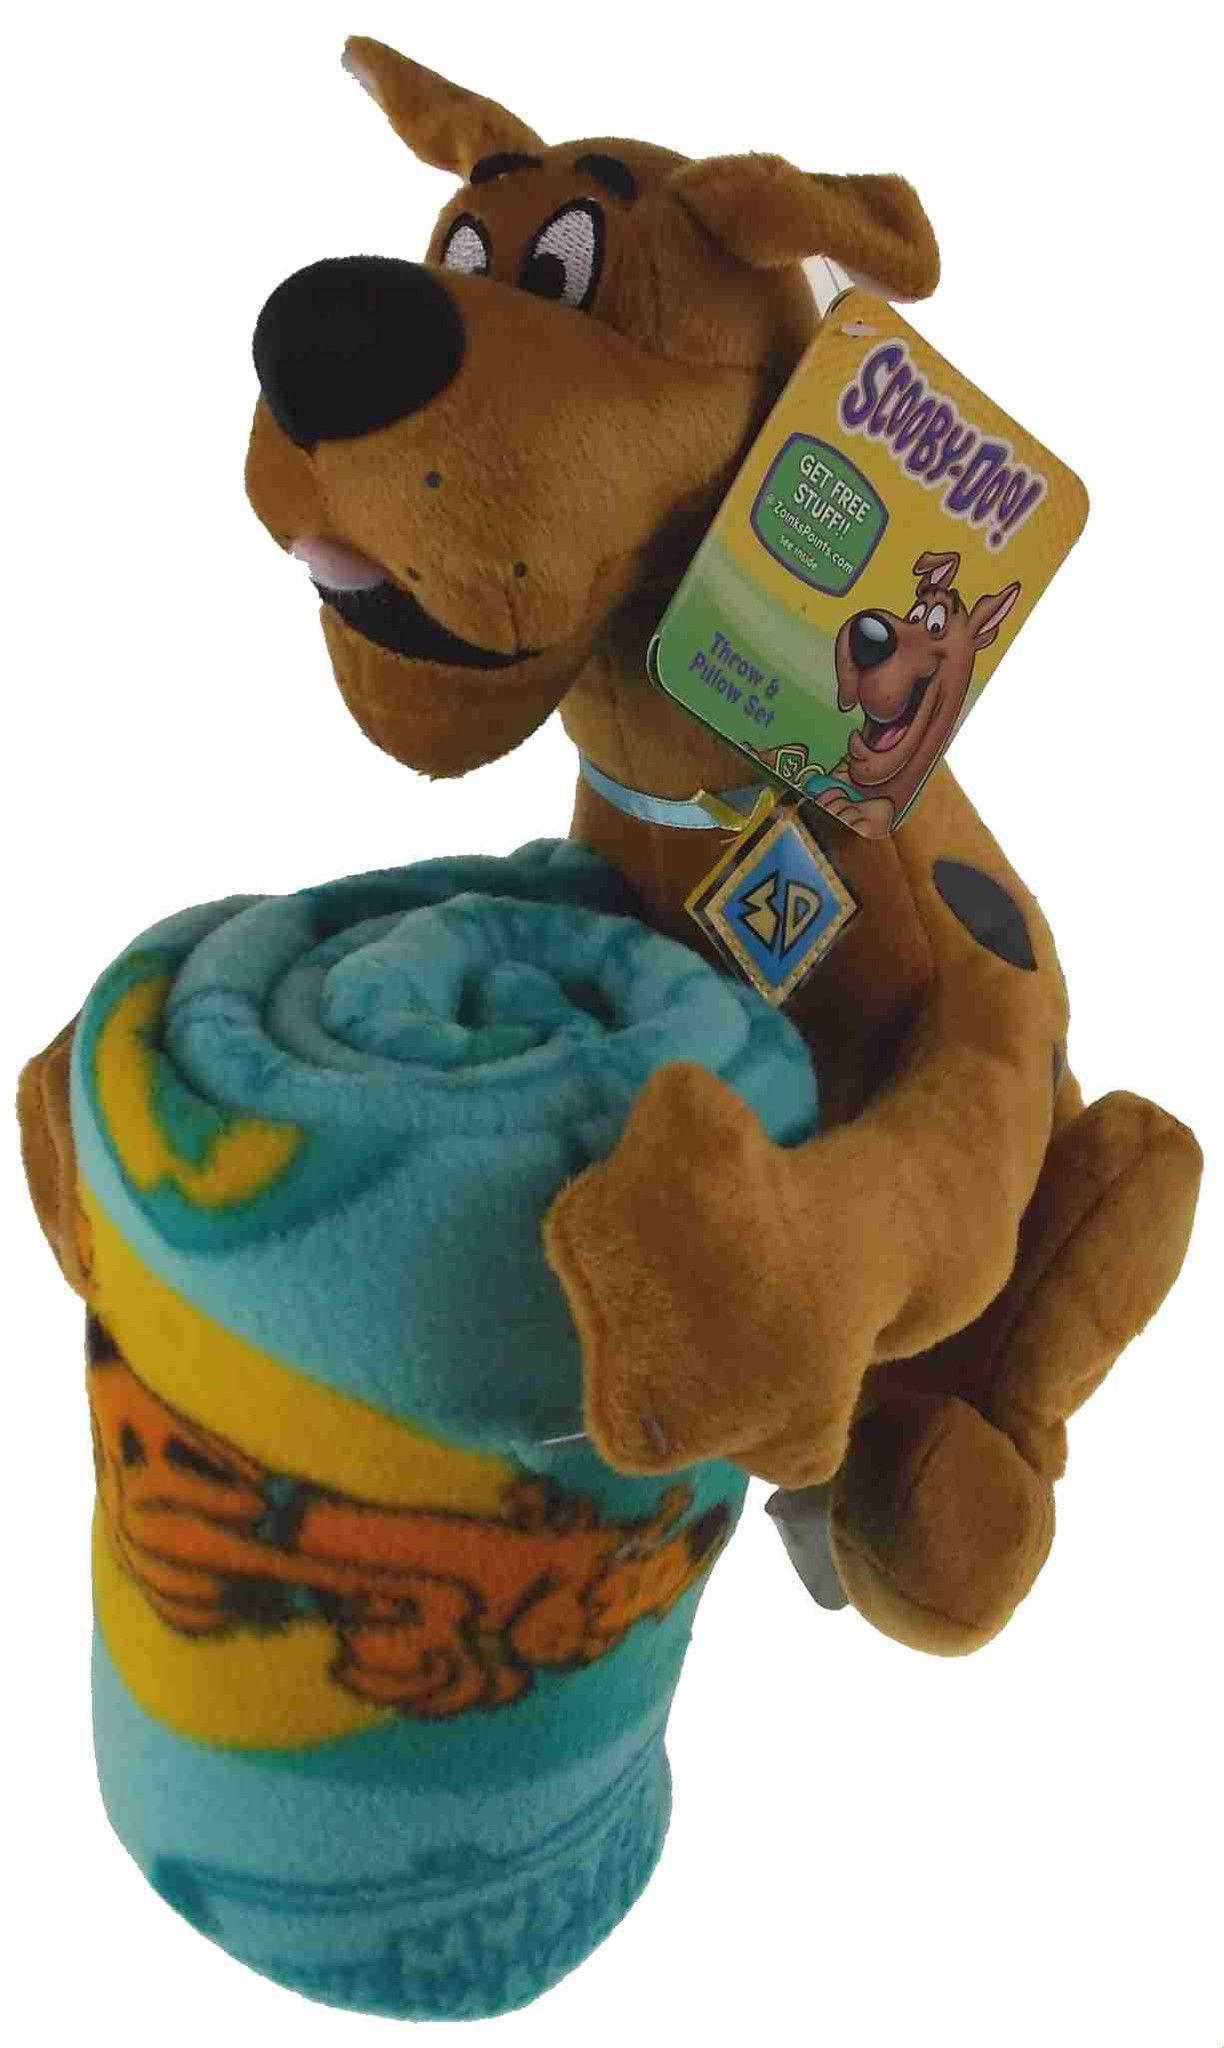 Scooby Doo Throw  Pillow Set Hugger Plush Blanket Soft